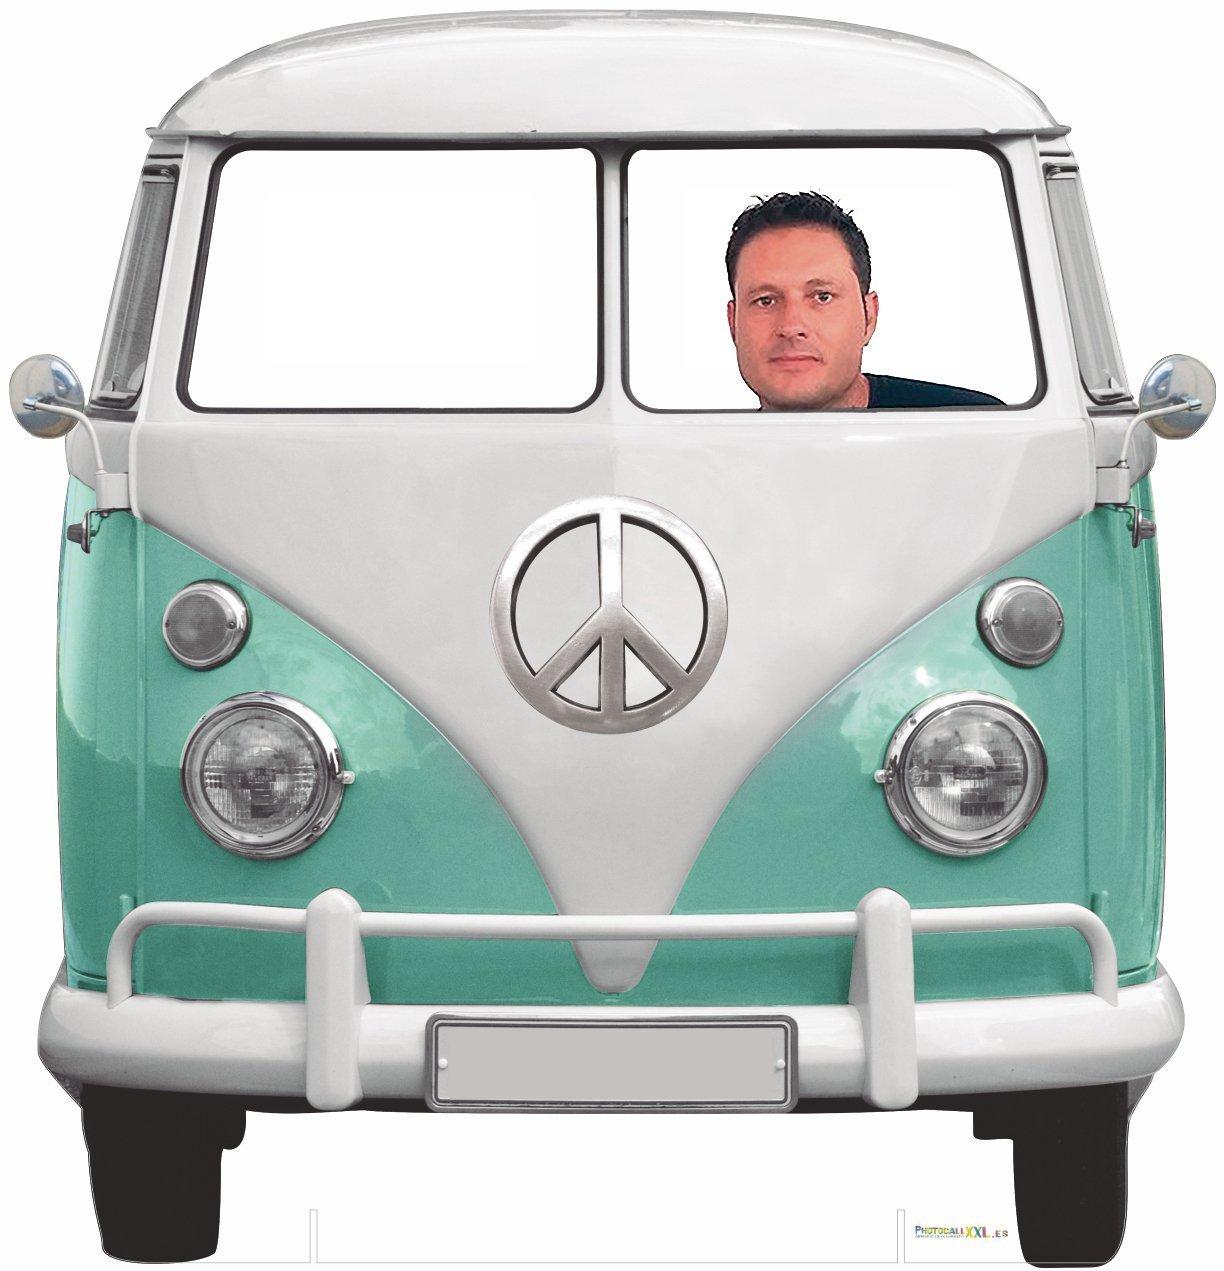 Photocall Coche Volkswagen Hippie 1,50x1,50cm | Photocall Divertido para Bodas, Cumpleaños, Eventos... | Photocall Furgoneta Volkswagen Resistente, Original, de Gran Calidad | Photocall que Contiene Dos Peanas para un Apoyo Excelente Oedim